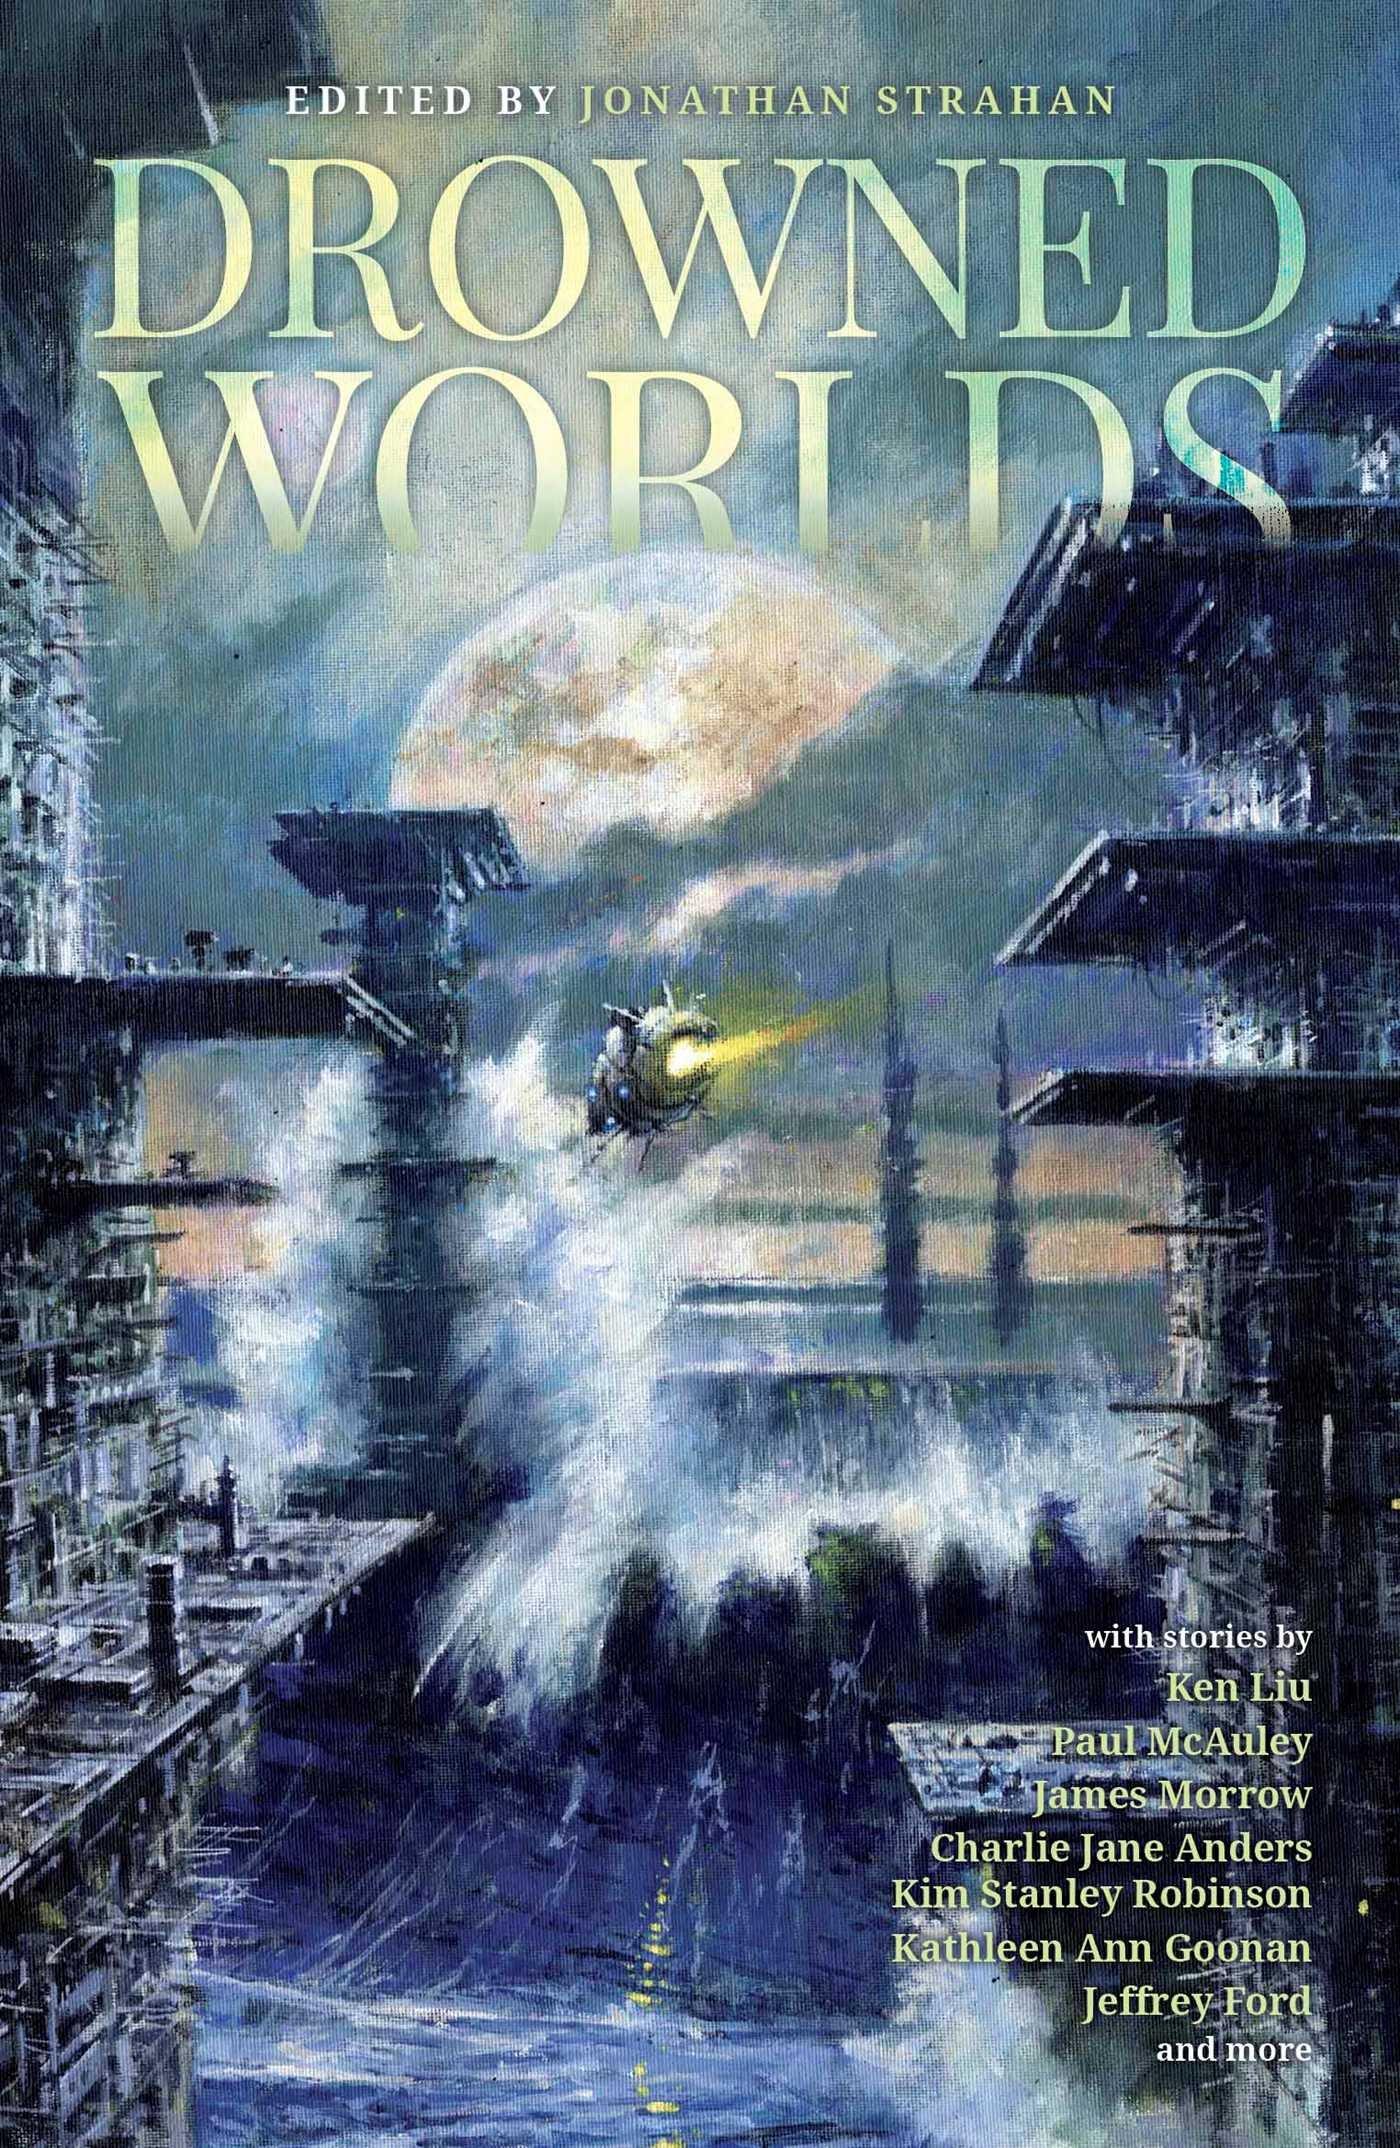 Drowned Worlds: Robinson, Anders, Liu, Mcauley, Goonan, Ford, Tidhar,  Morrow, Jonathan Strahan: 9781781084519: Amazon: Books